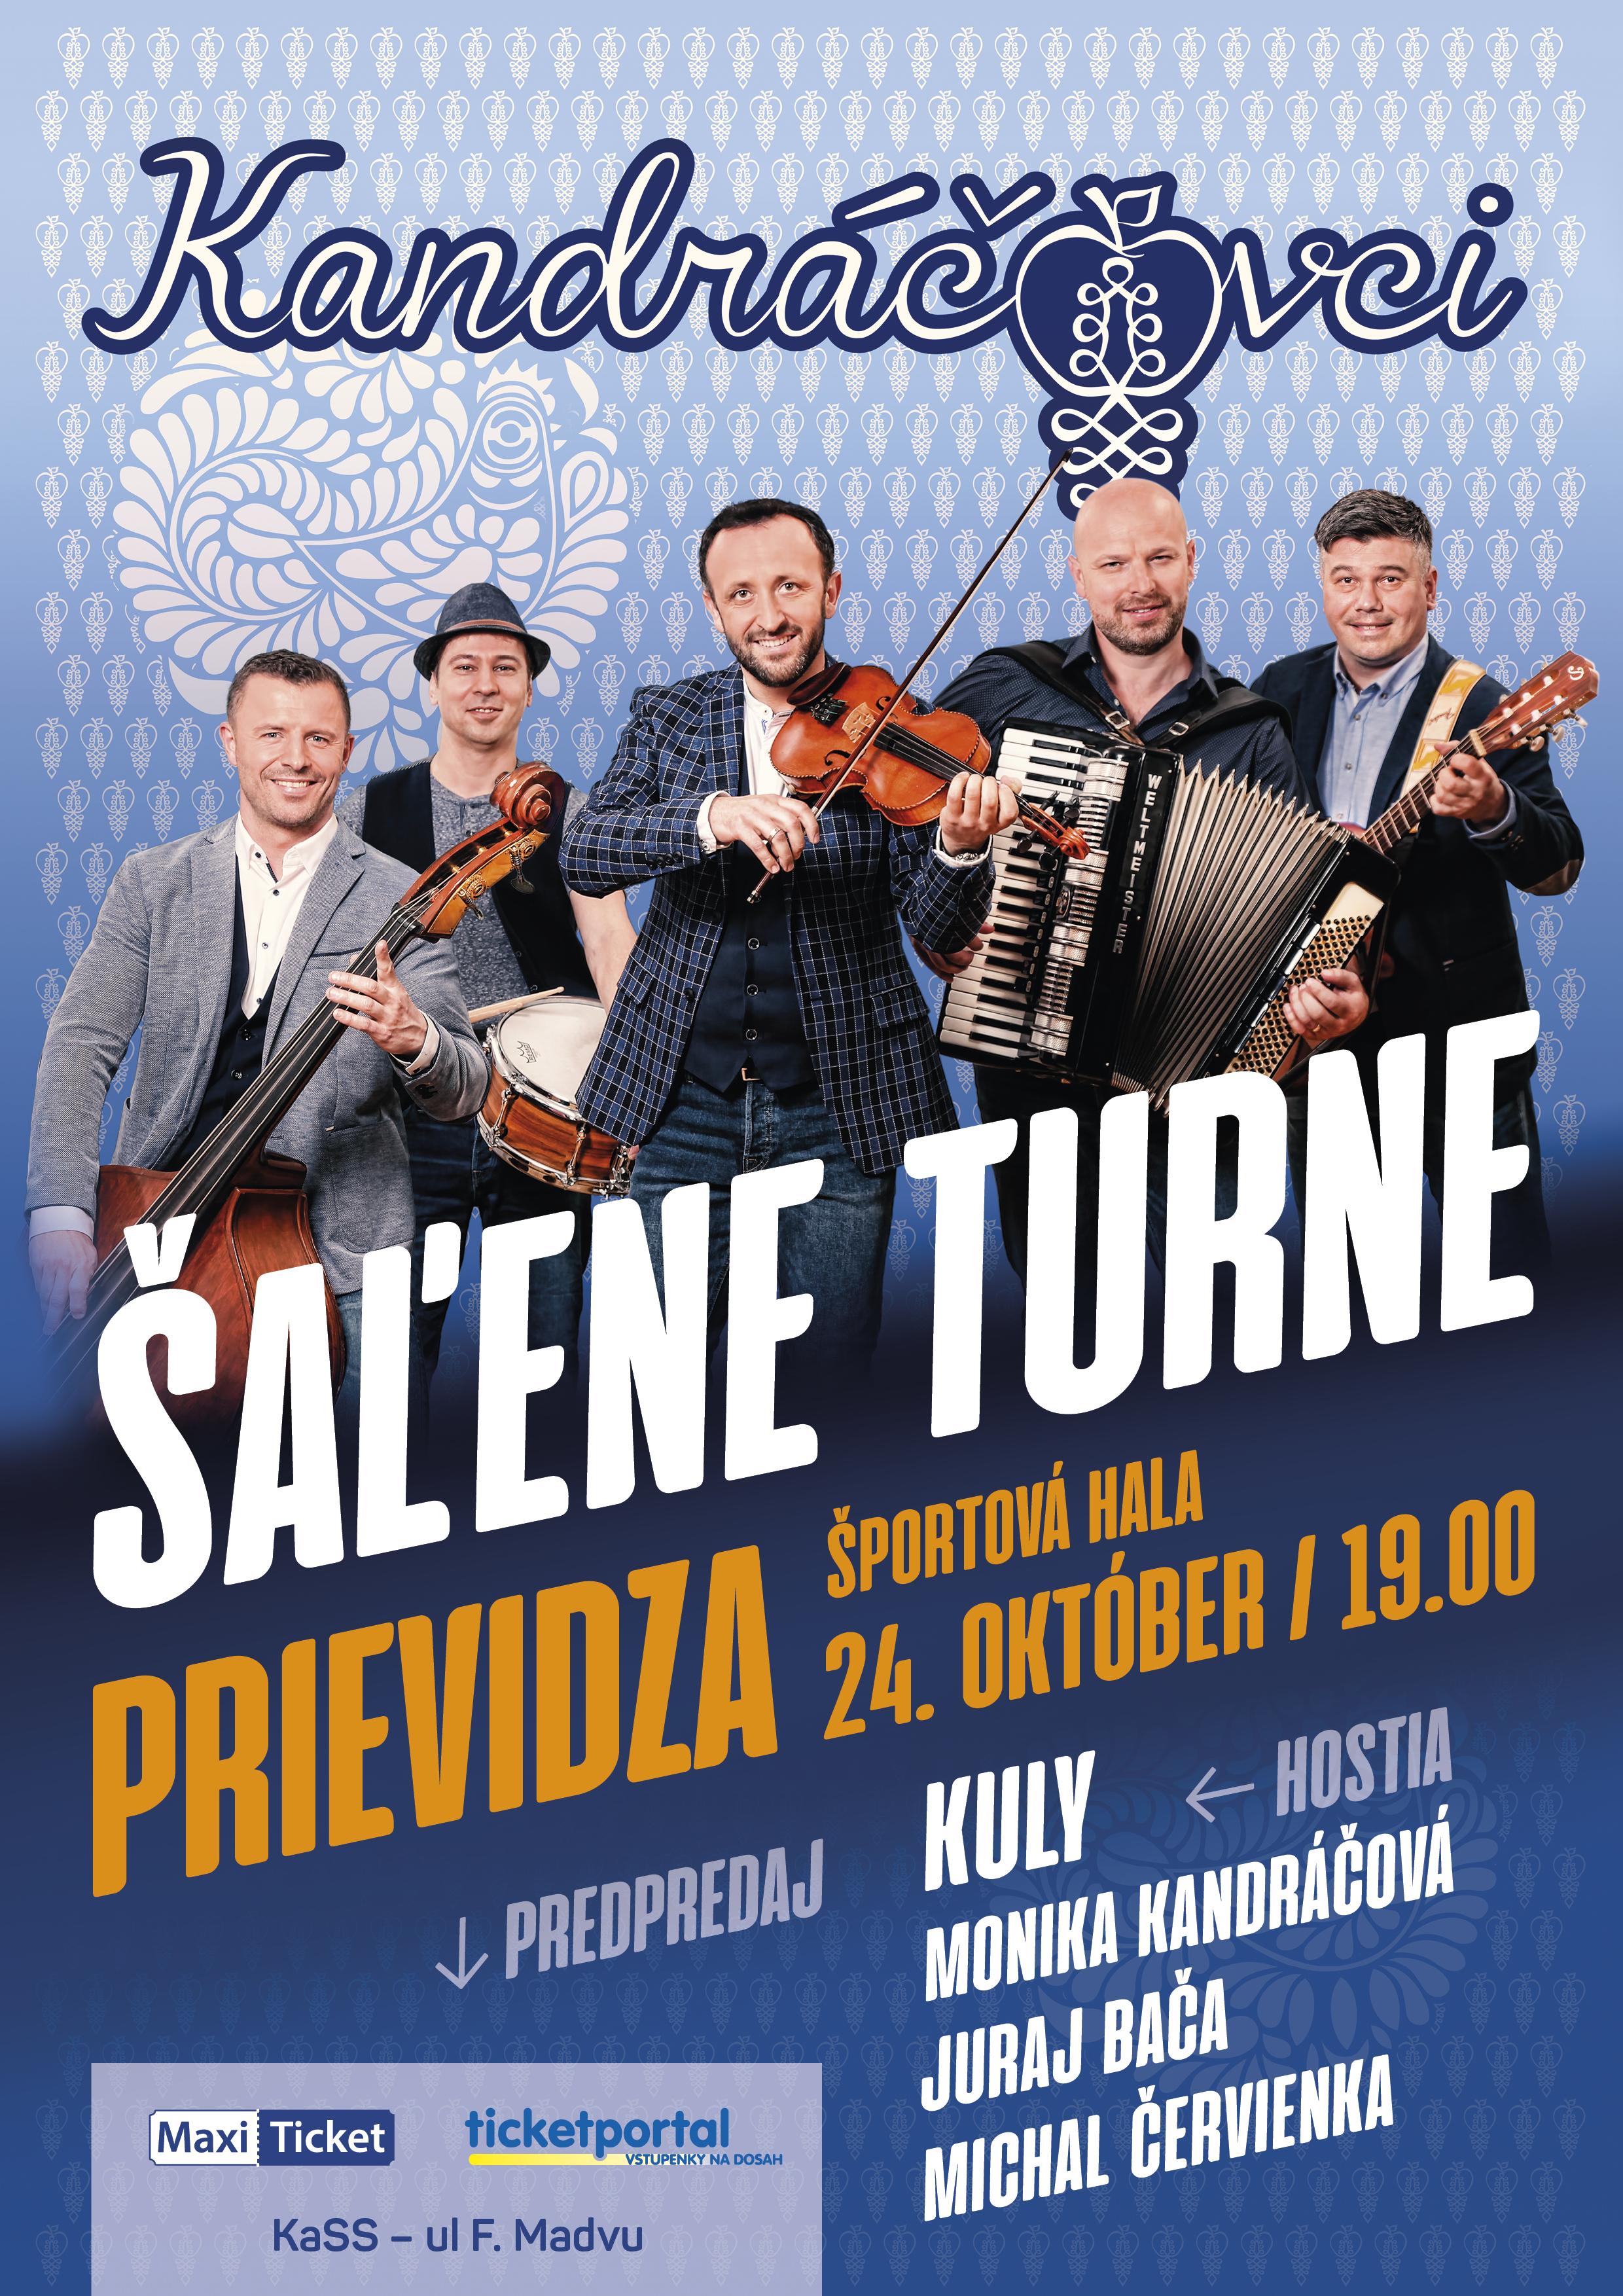 Kandráčovci - Šaľene turne - Prievidza 2019